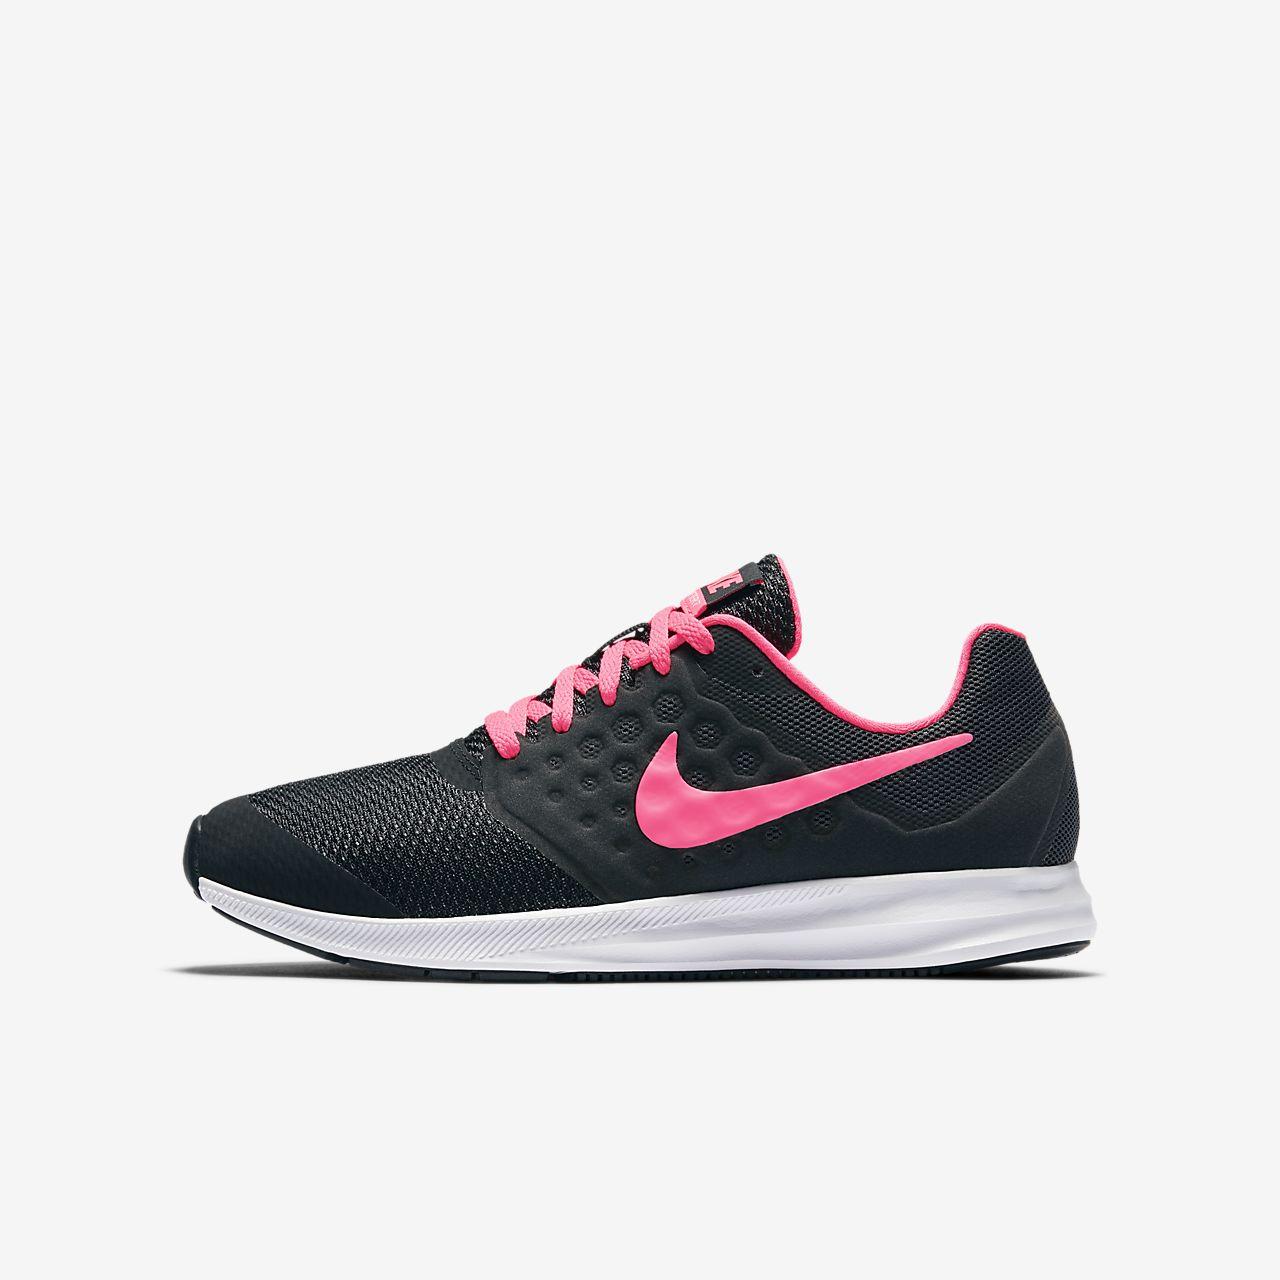 ... Nike Downshifter 7 Older Kids' Running Shoe